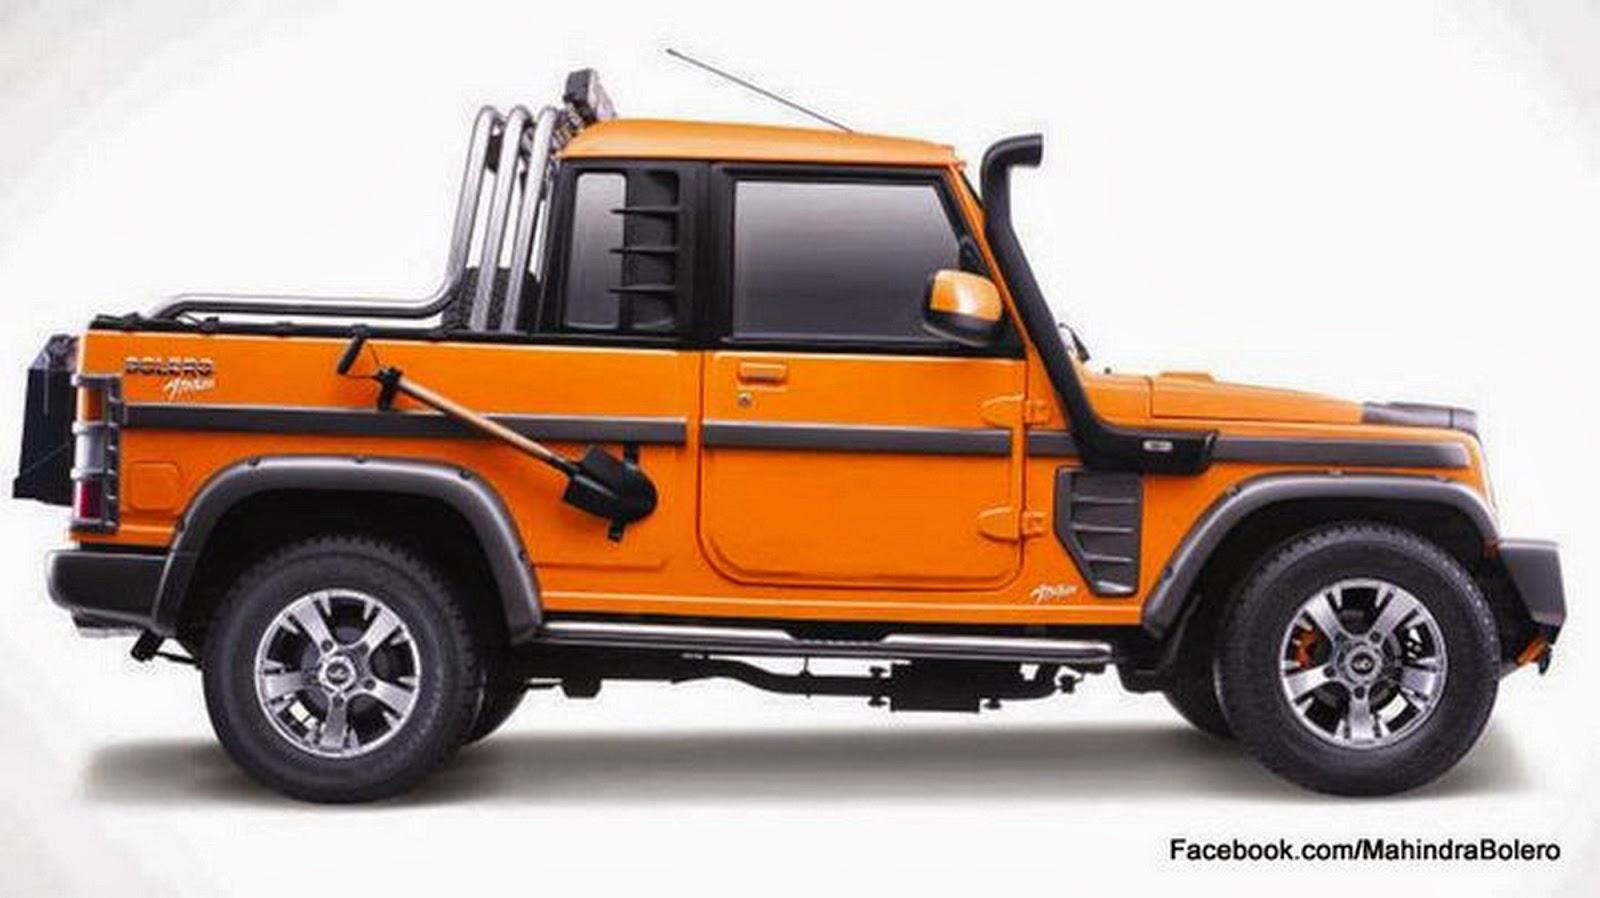 Mahindra Bolero Wallpaper 2014 Just Welcome To Automotive